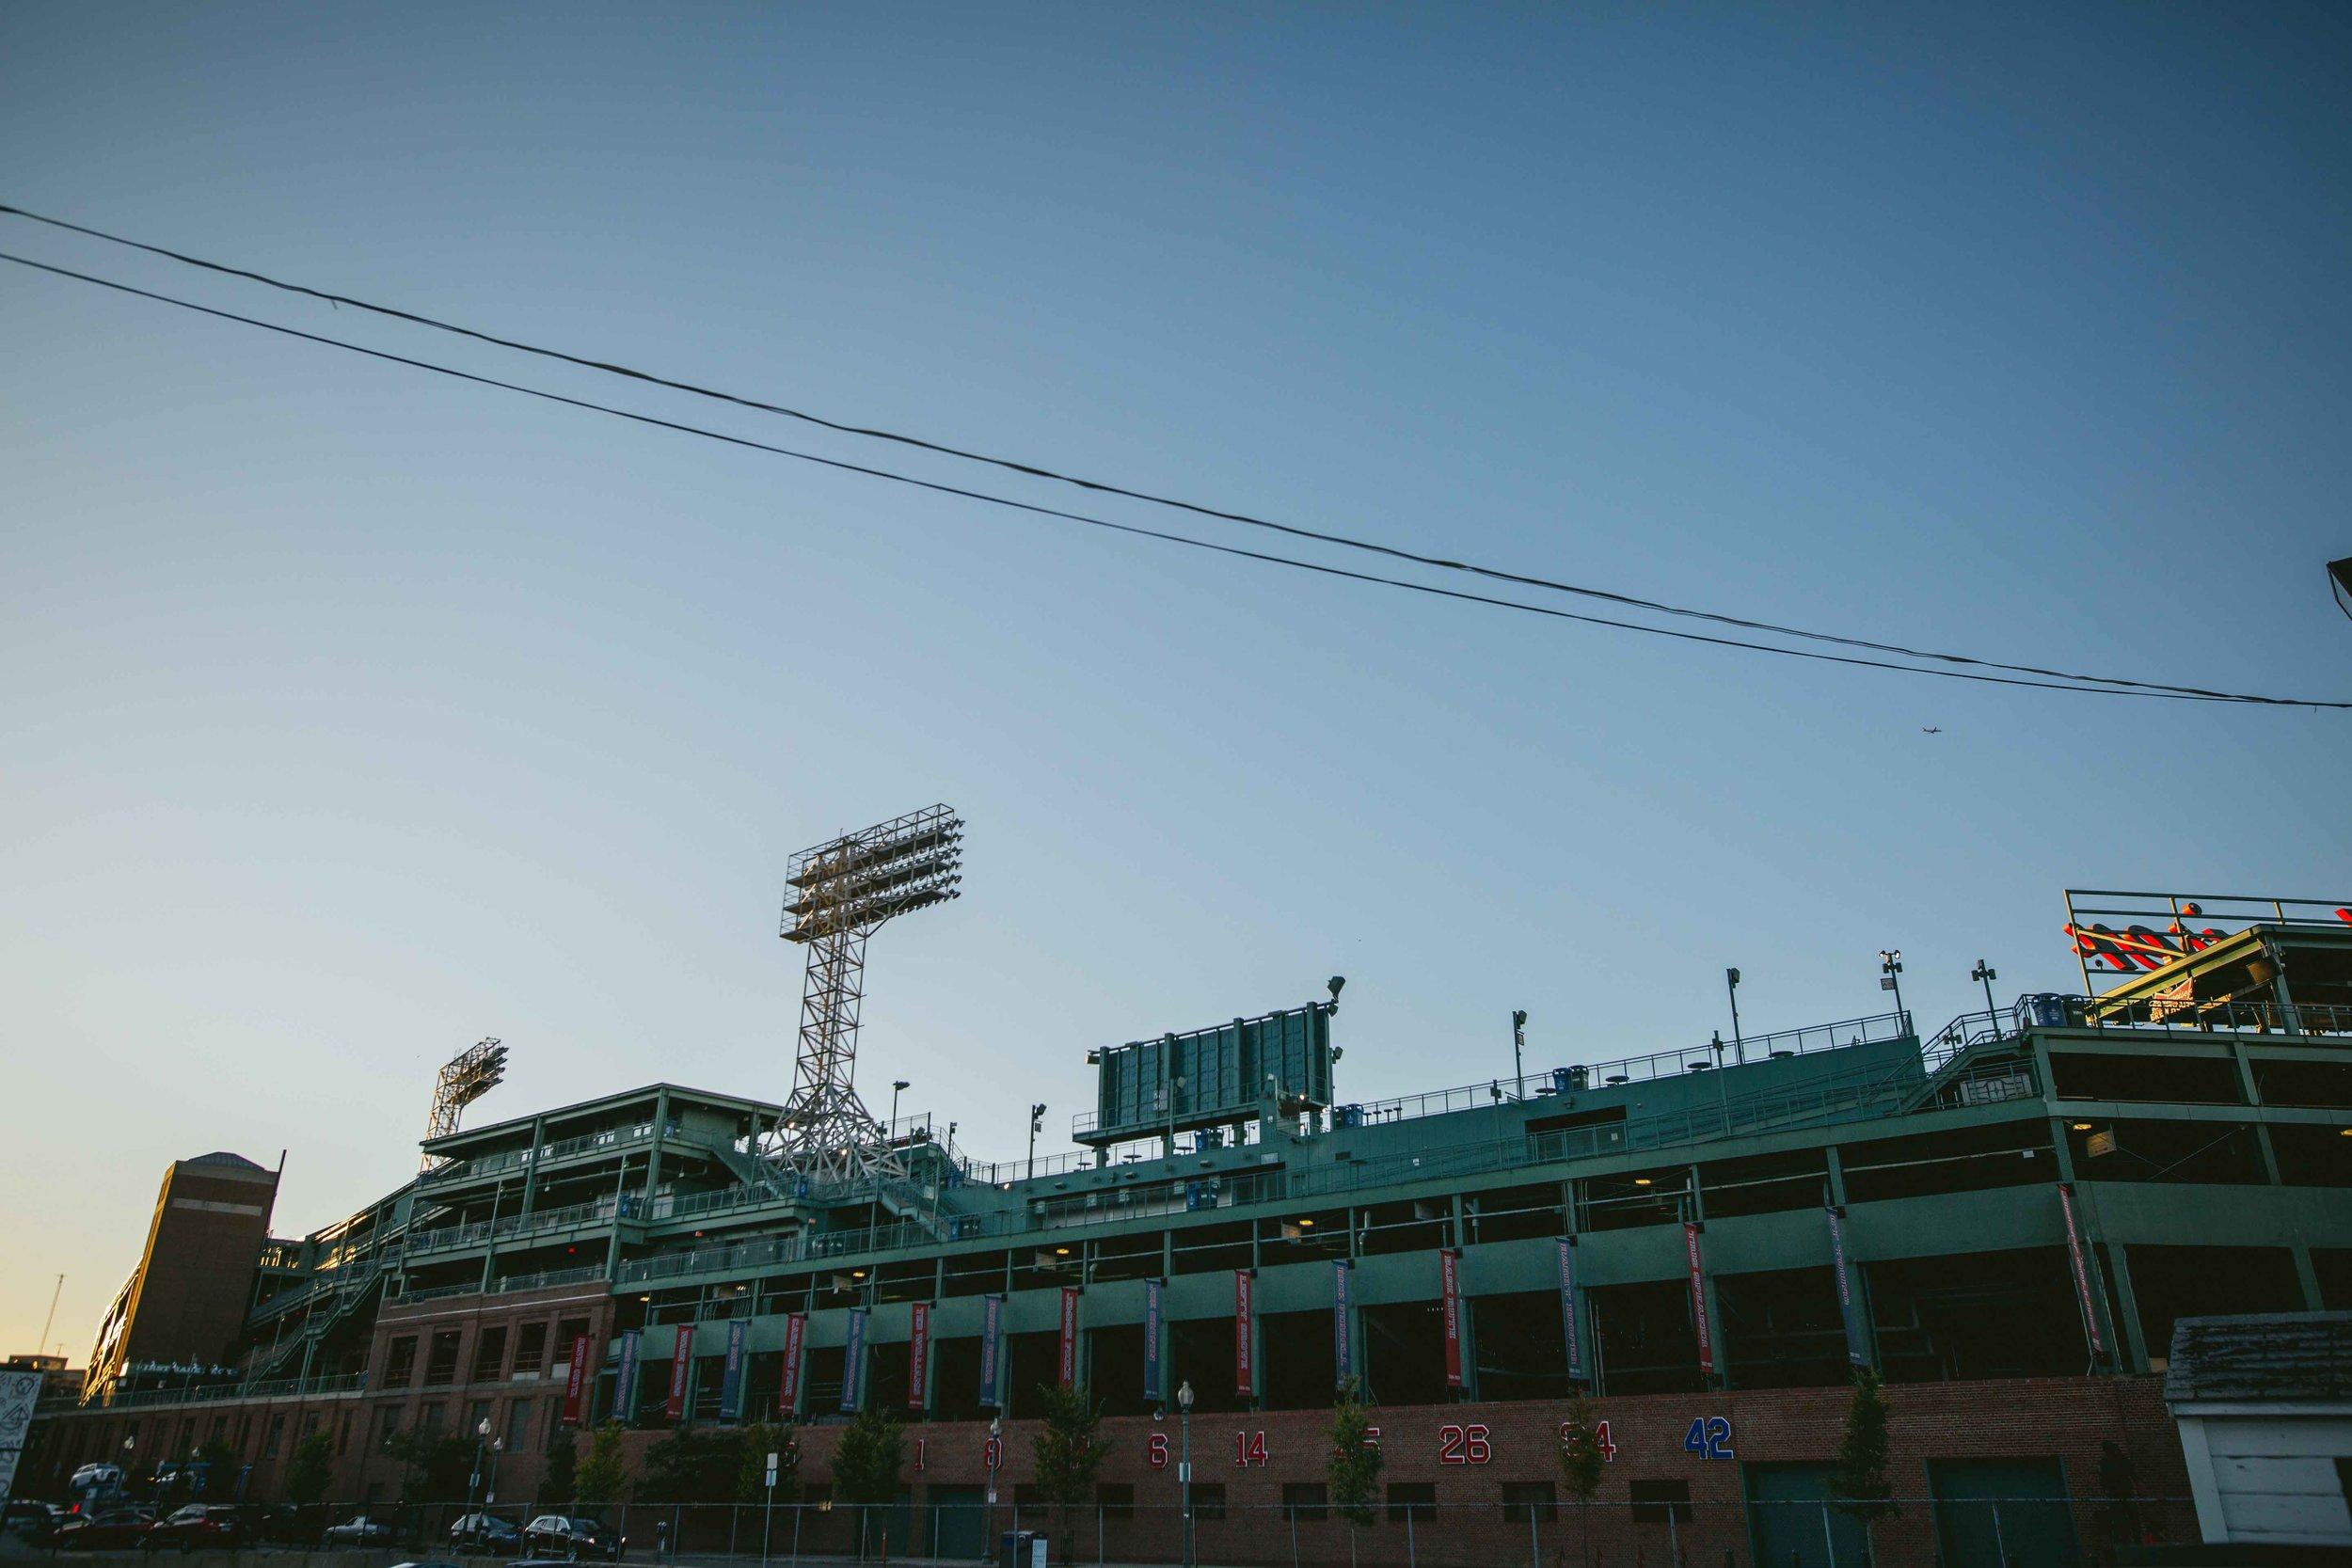 boston-5472.jpg